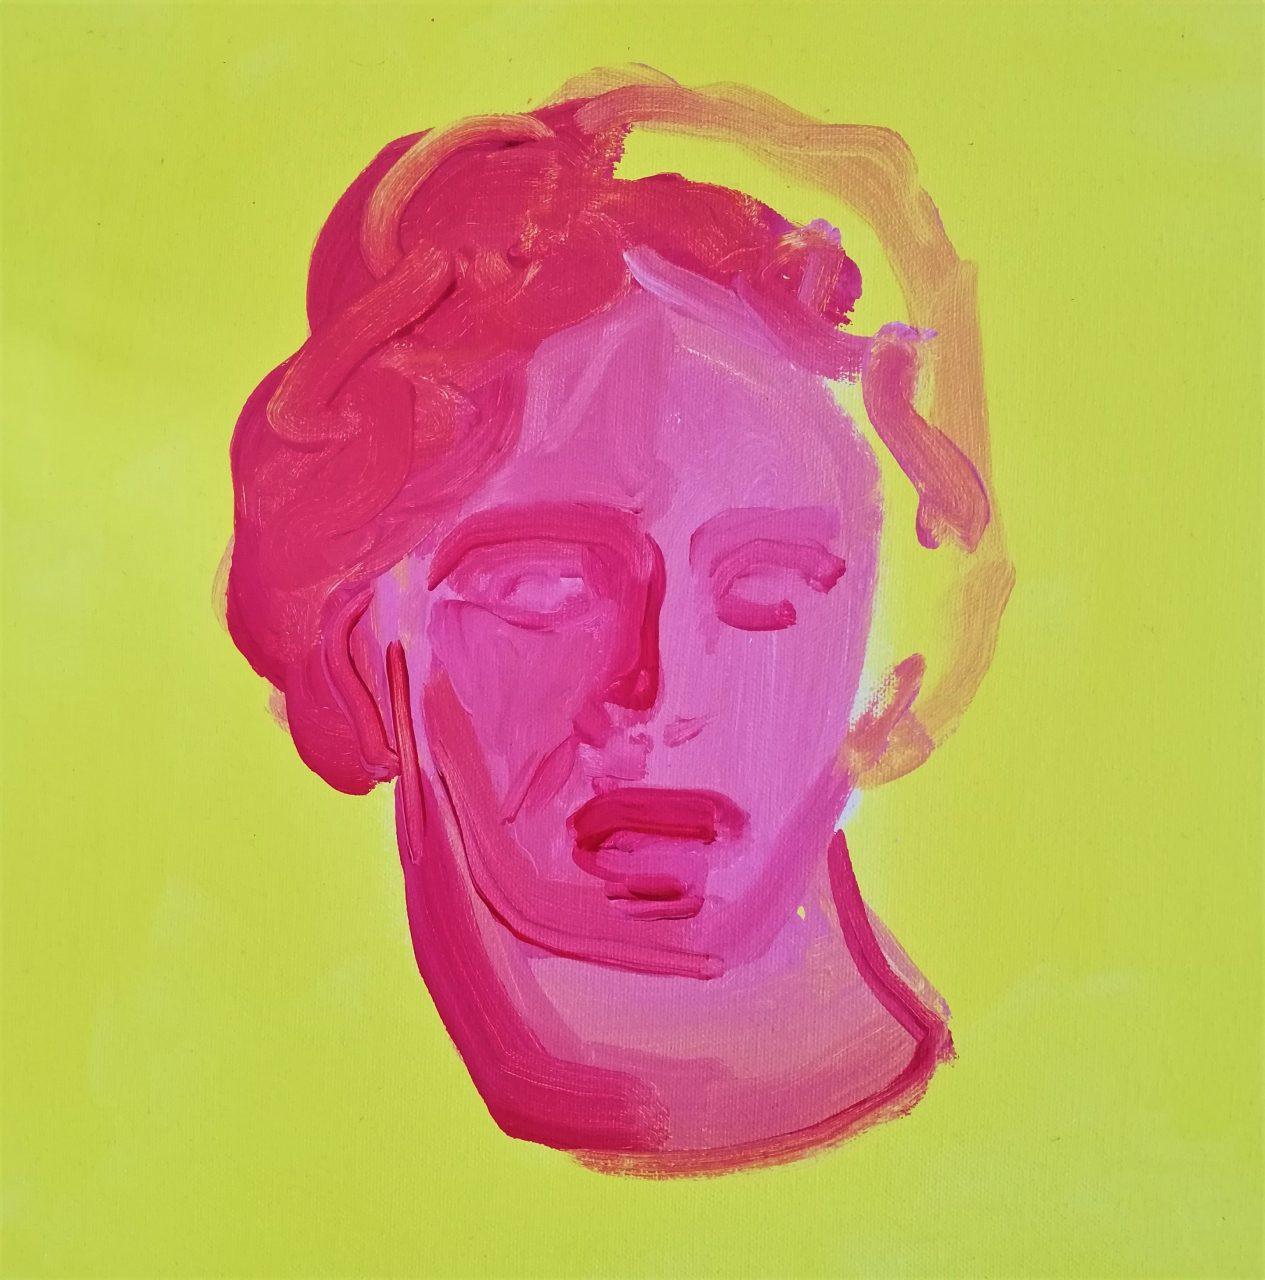 UNTITLED 30 x 30 cm, acrylic on canvas, 2019.